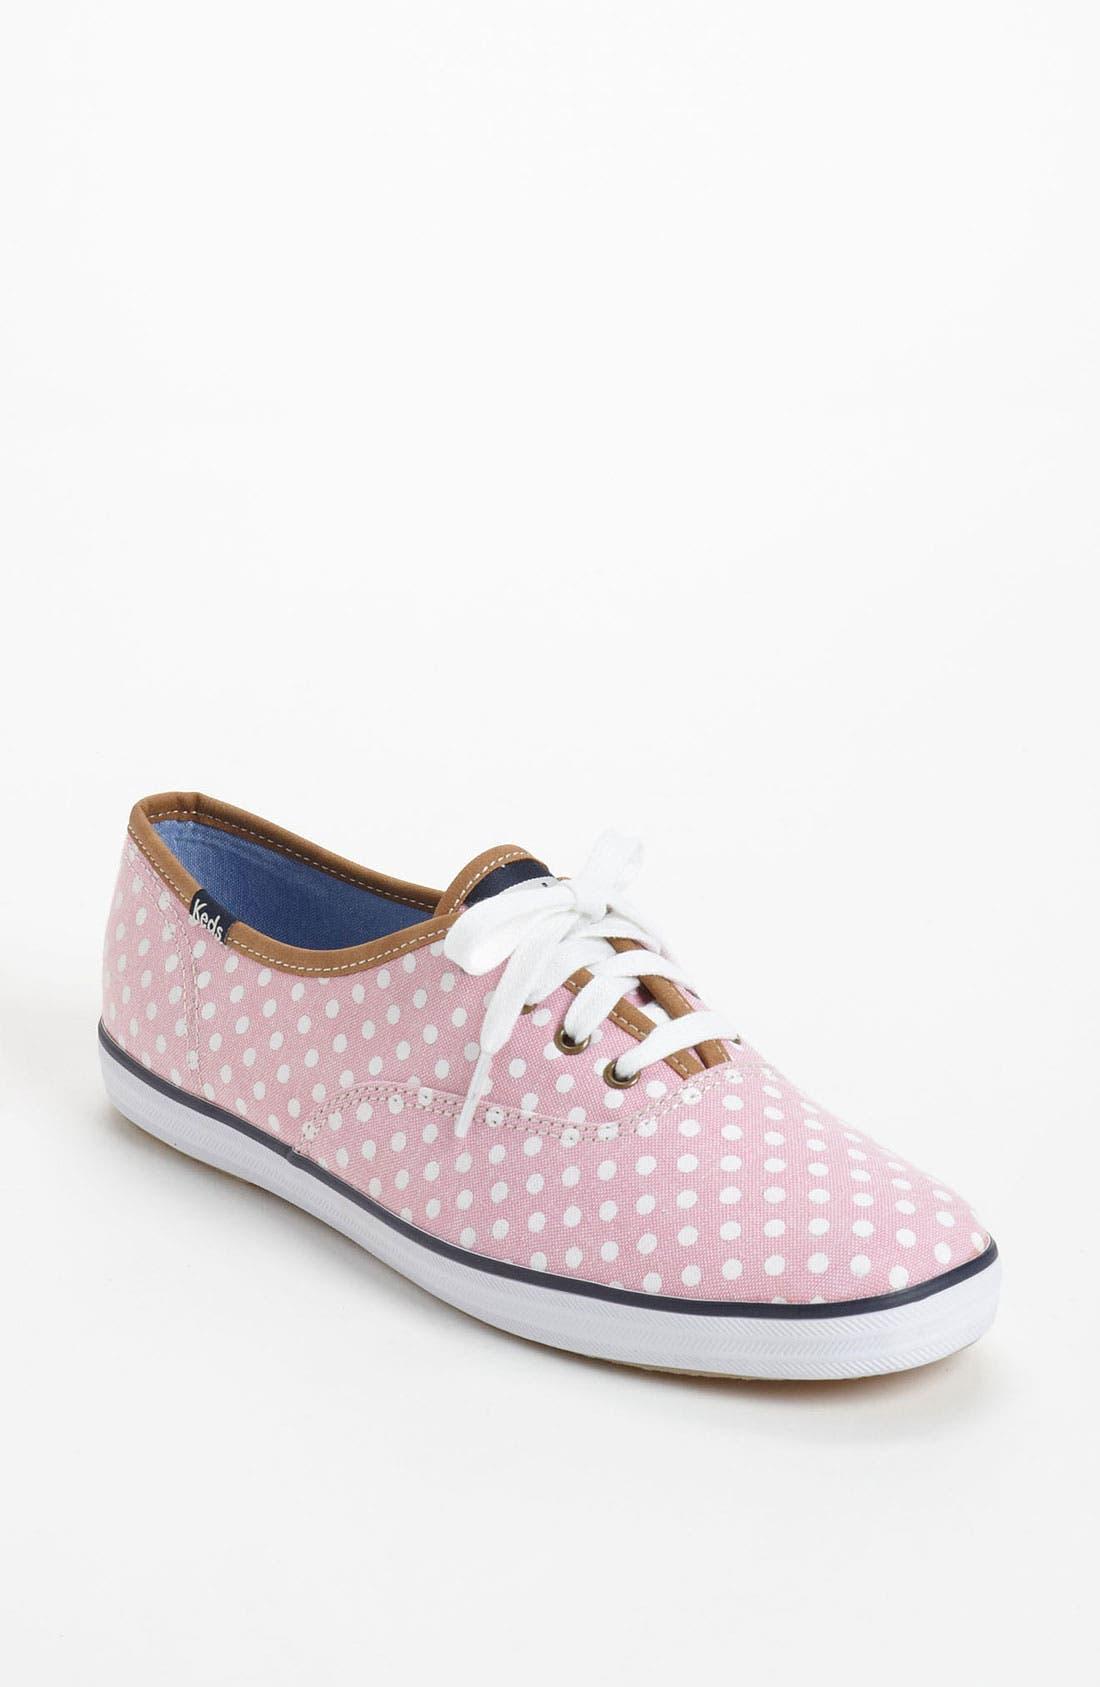 Main Image - Keds® 'Champion - Dot' Sneaker (Women)